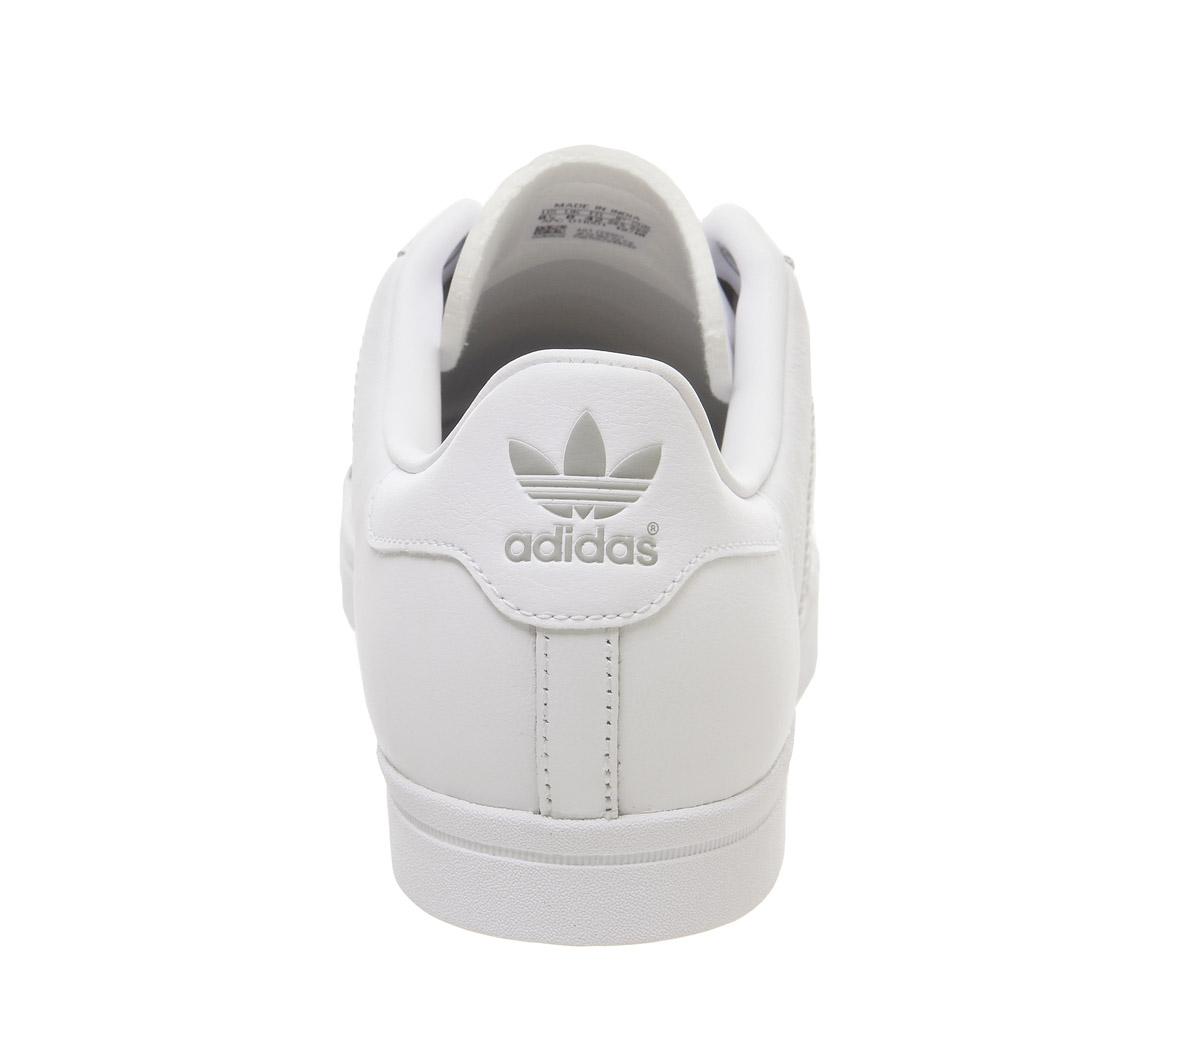 Adidas-Coast-Star-Baskets-Blanc-Baskets-Chaussures miniature 8